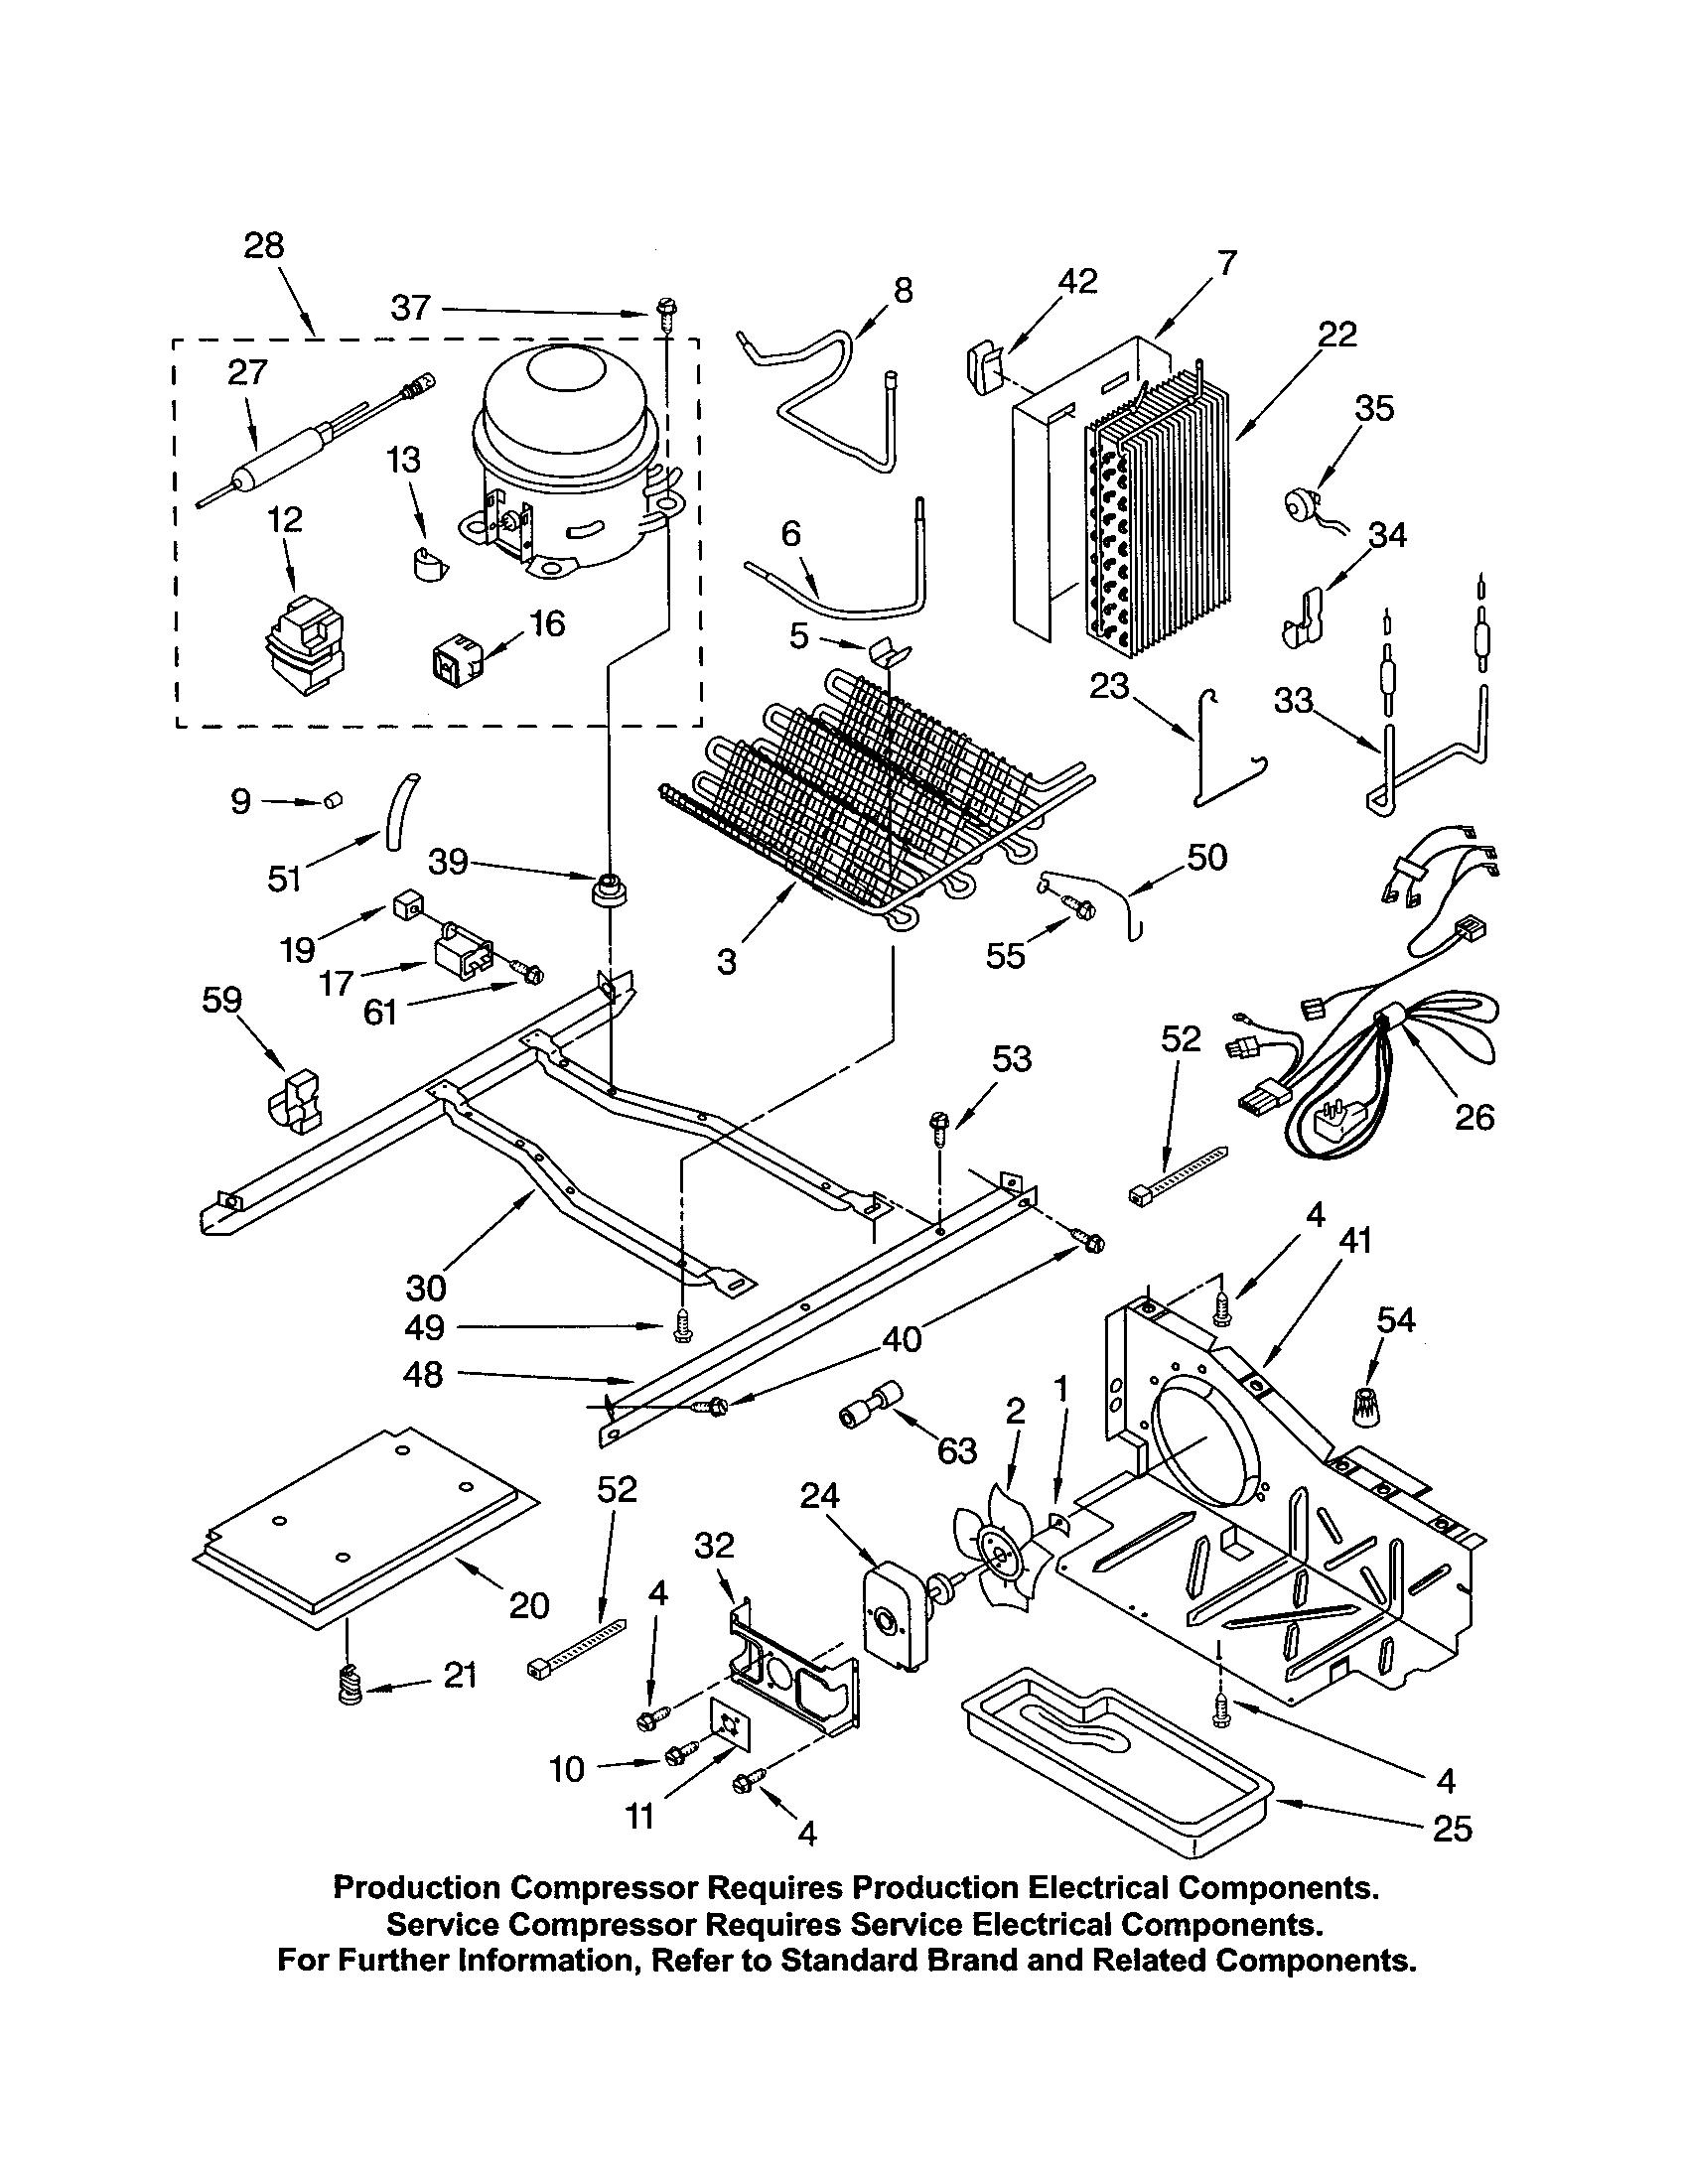 how to change a compressor relay on a kenmore coldspot model xxxxxxxxxxx